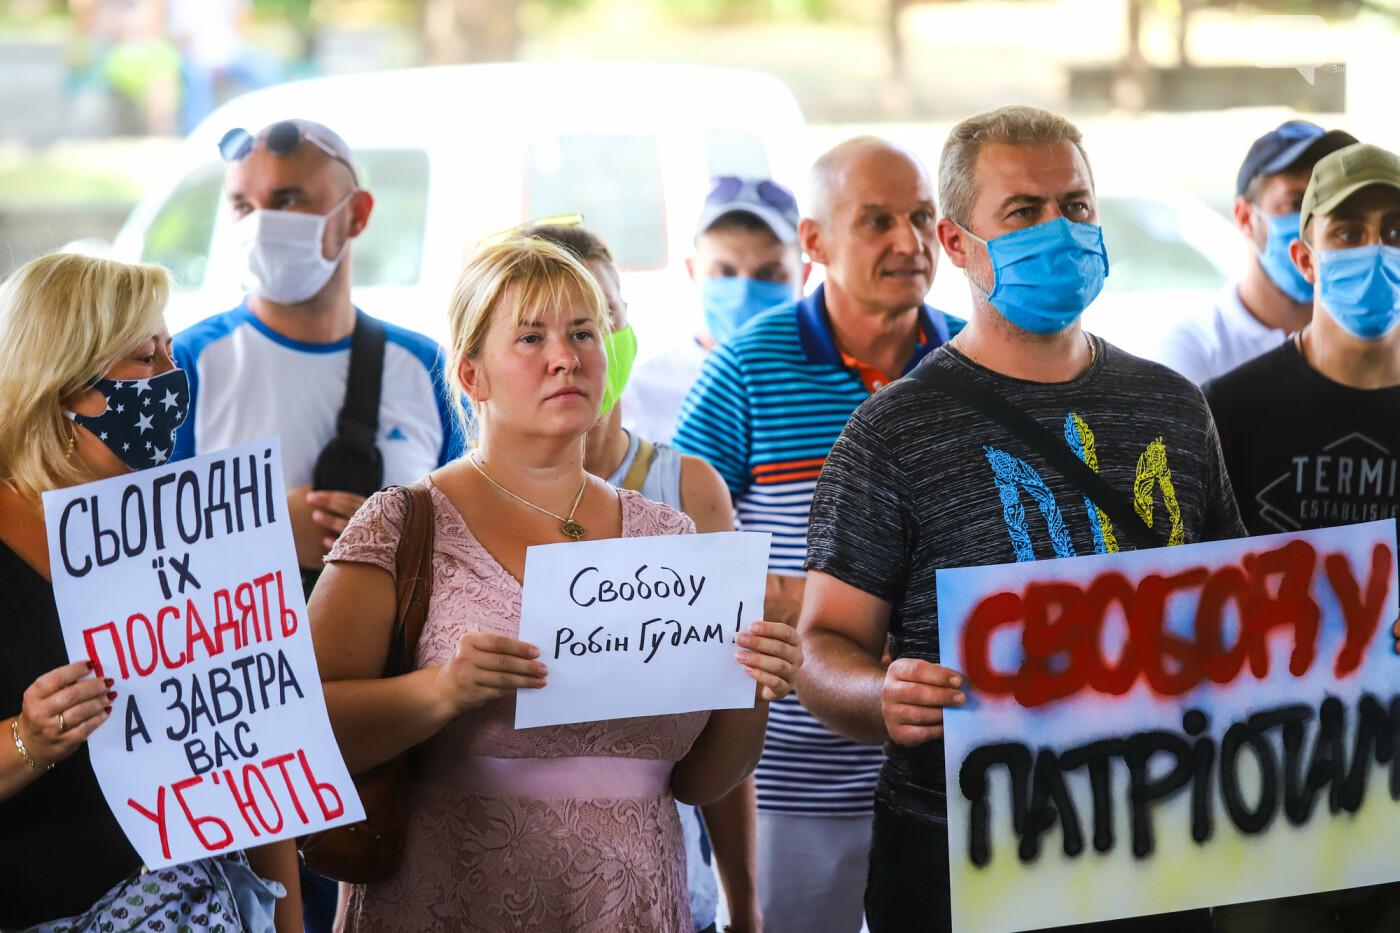 """Захист країни - не злочин"": в Запорожье патриоты провели митинг у стен нацполиции, - ФОТОРЕПОРТАЖ , фото-11"